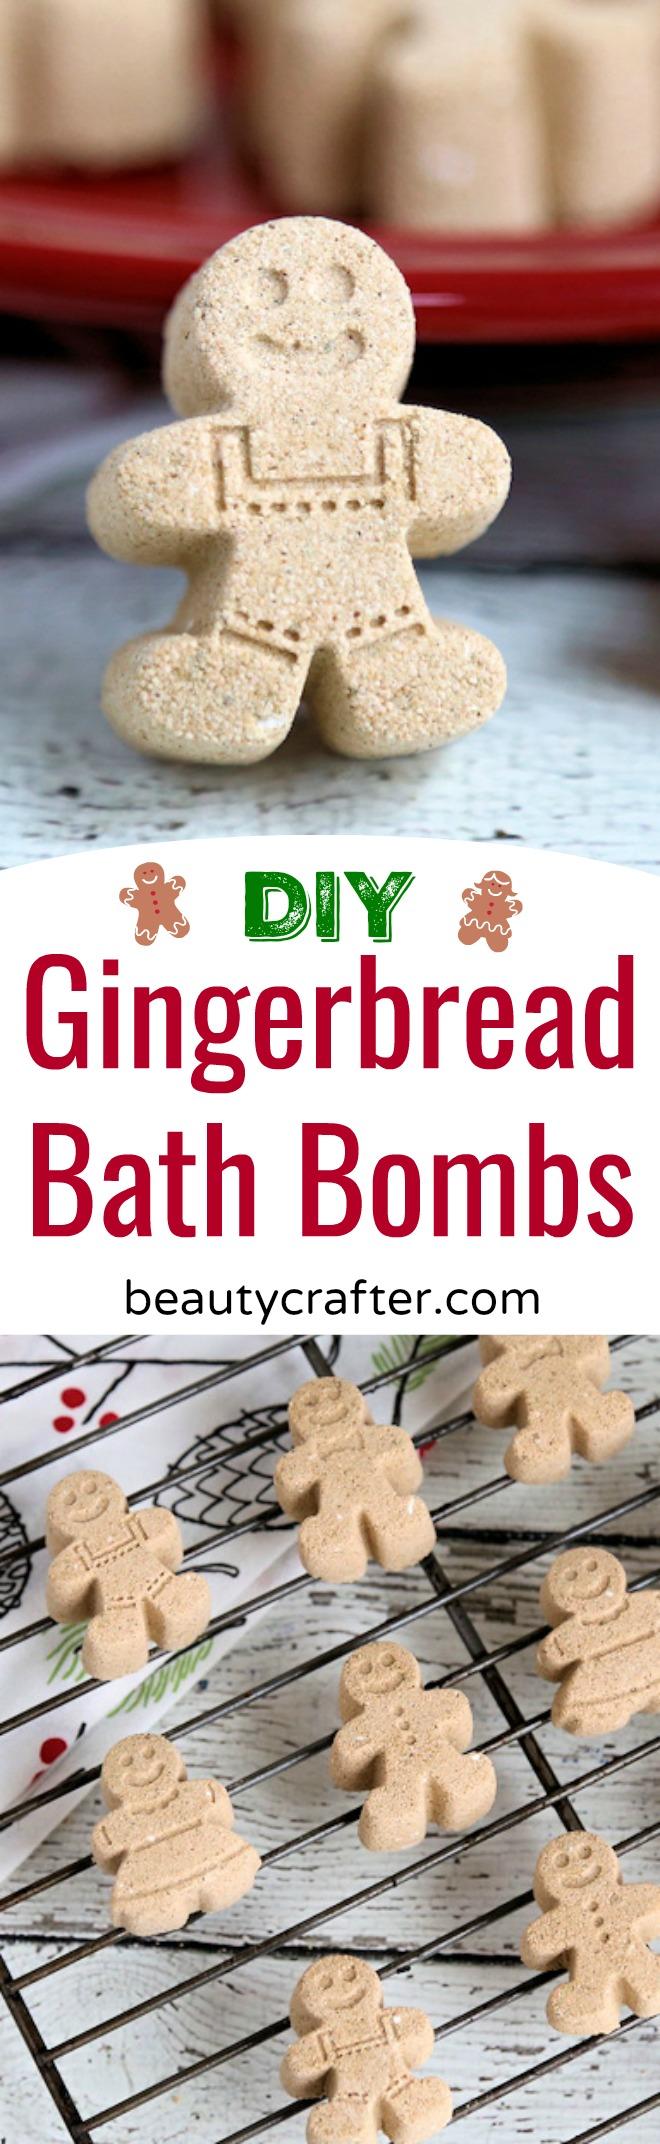 DIY Gingerbread Bath Bombs recipe #bathbombs #gingerbread #DIYGifts #Christmas